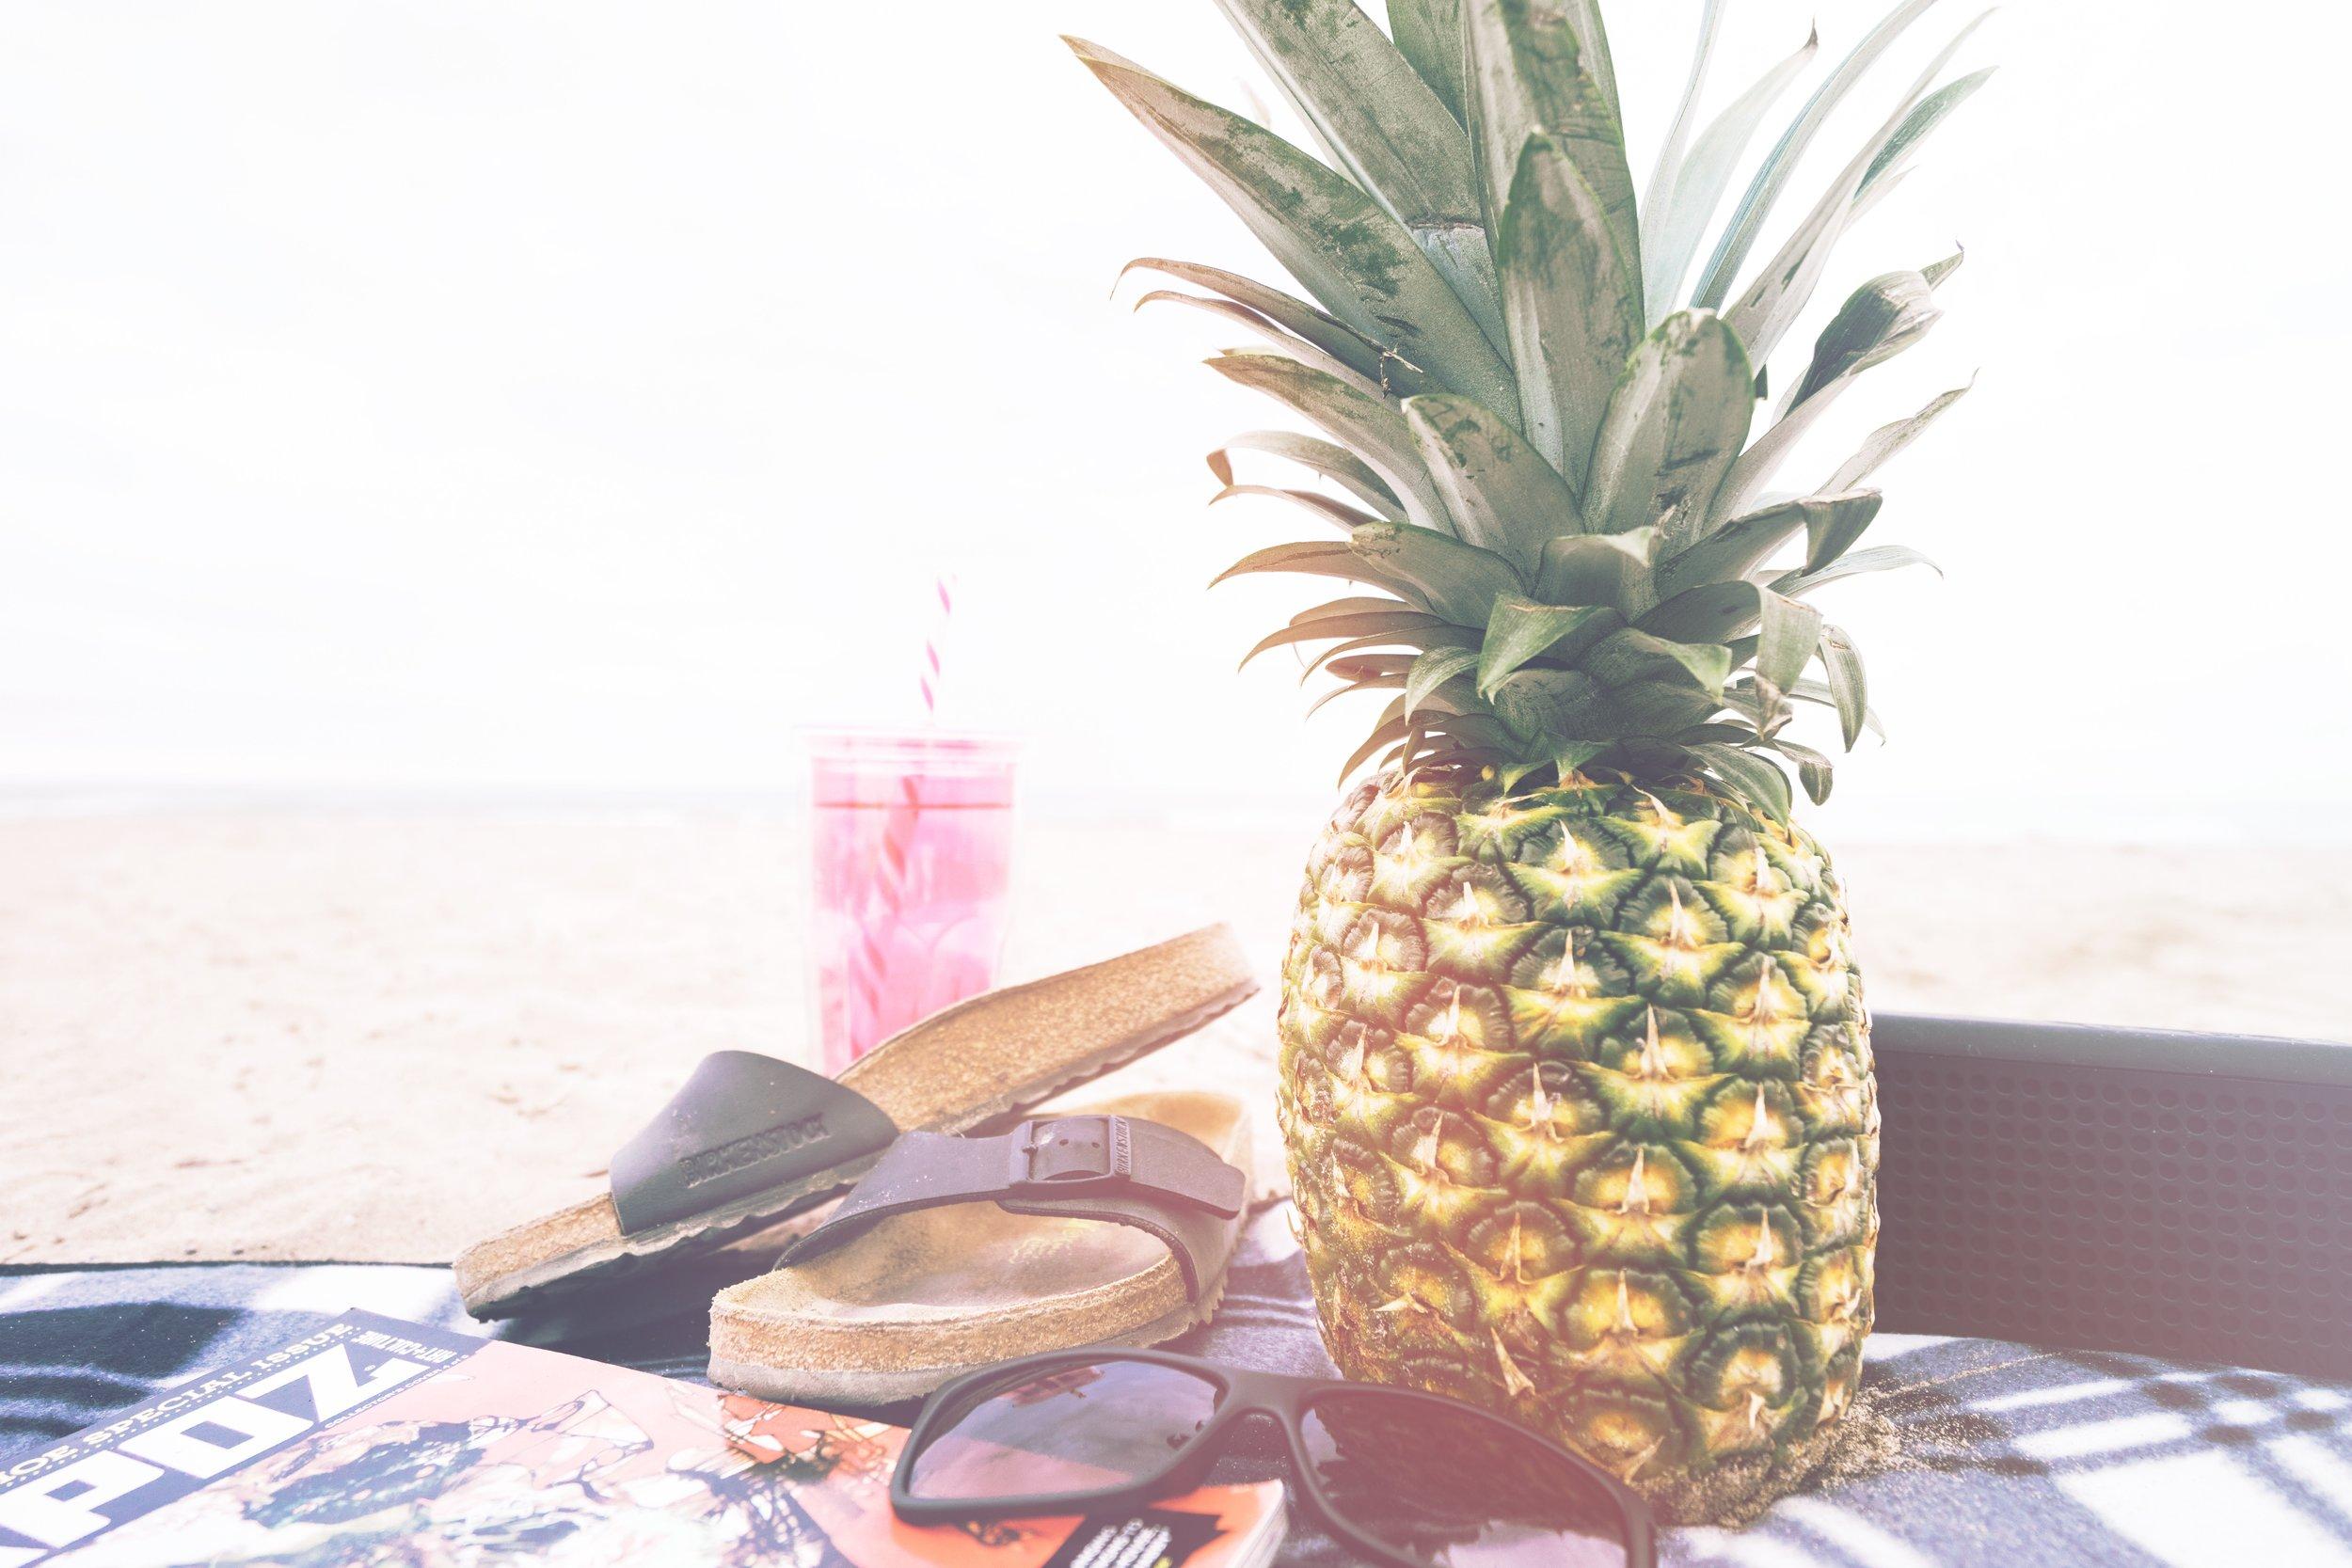 pineapple-supply-co-31096-unsplash.jpg